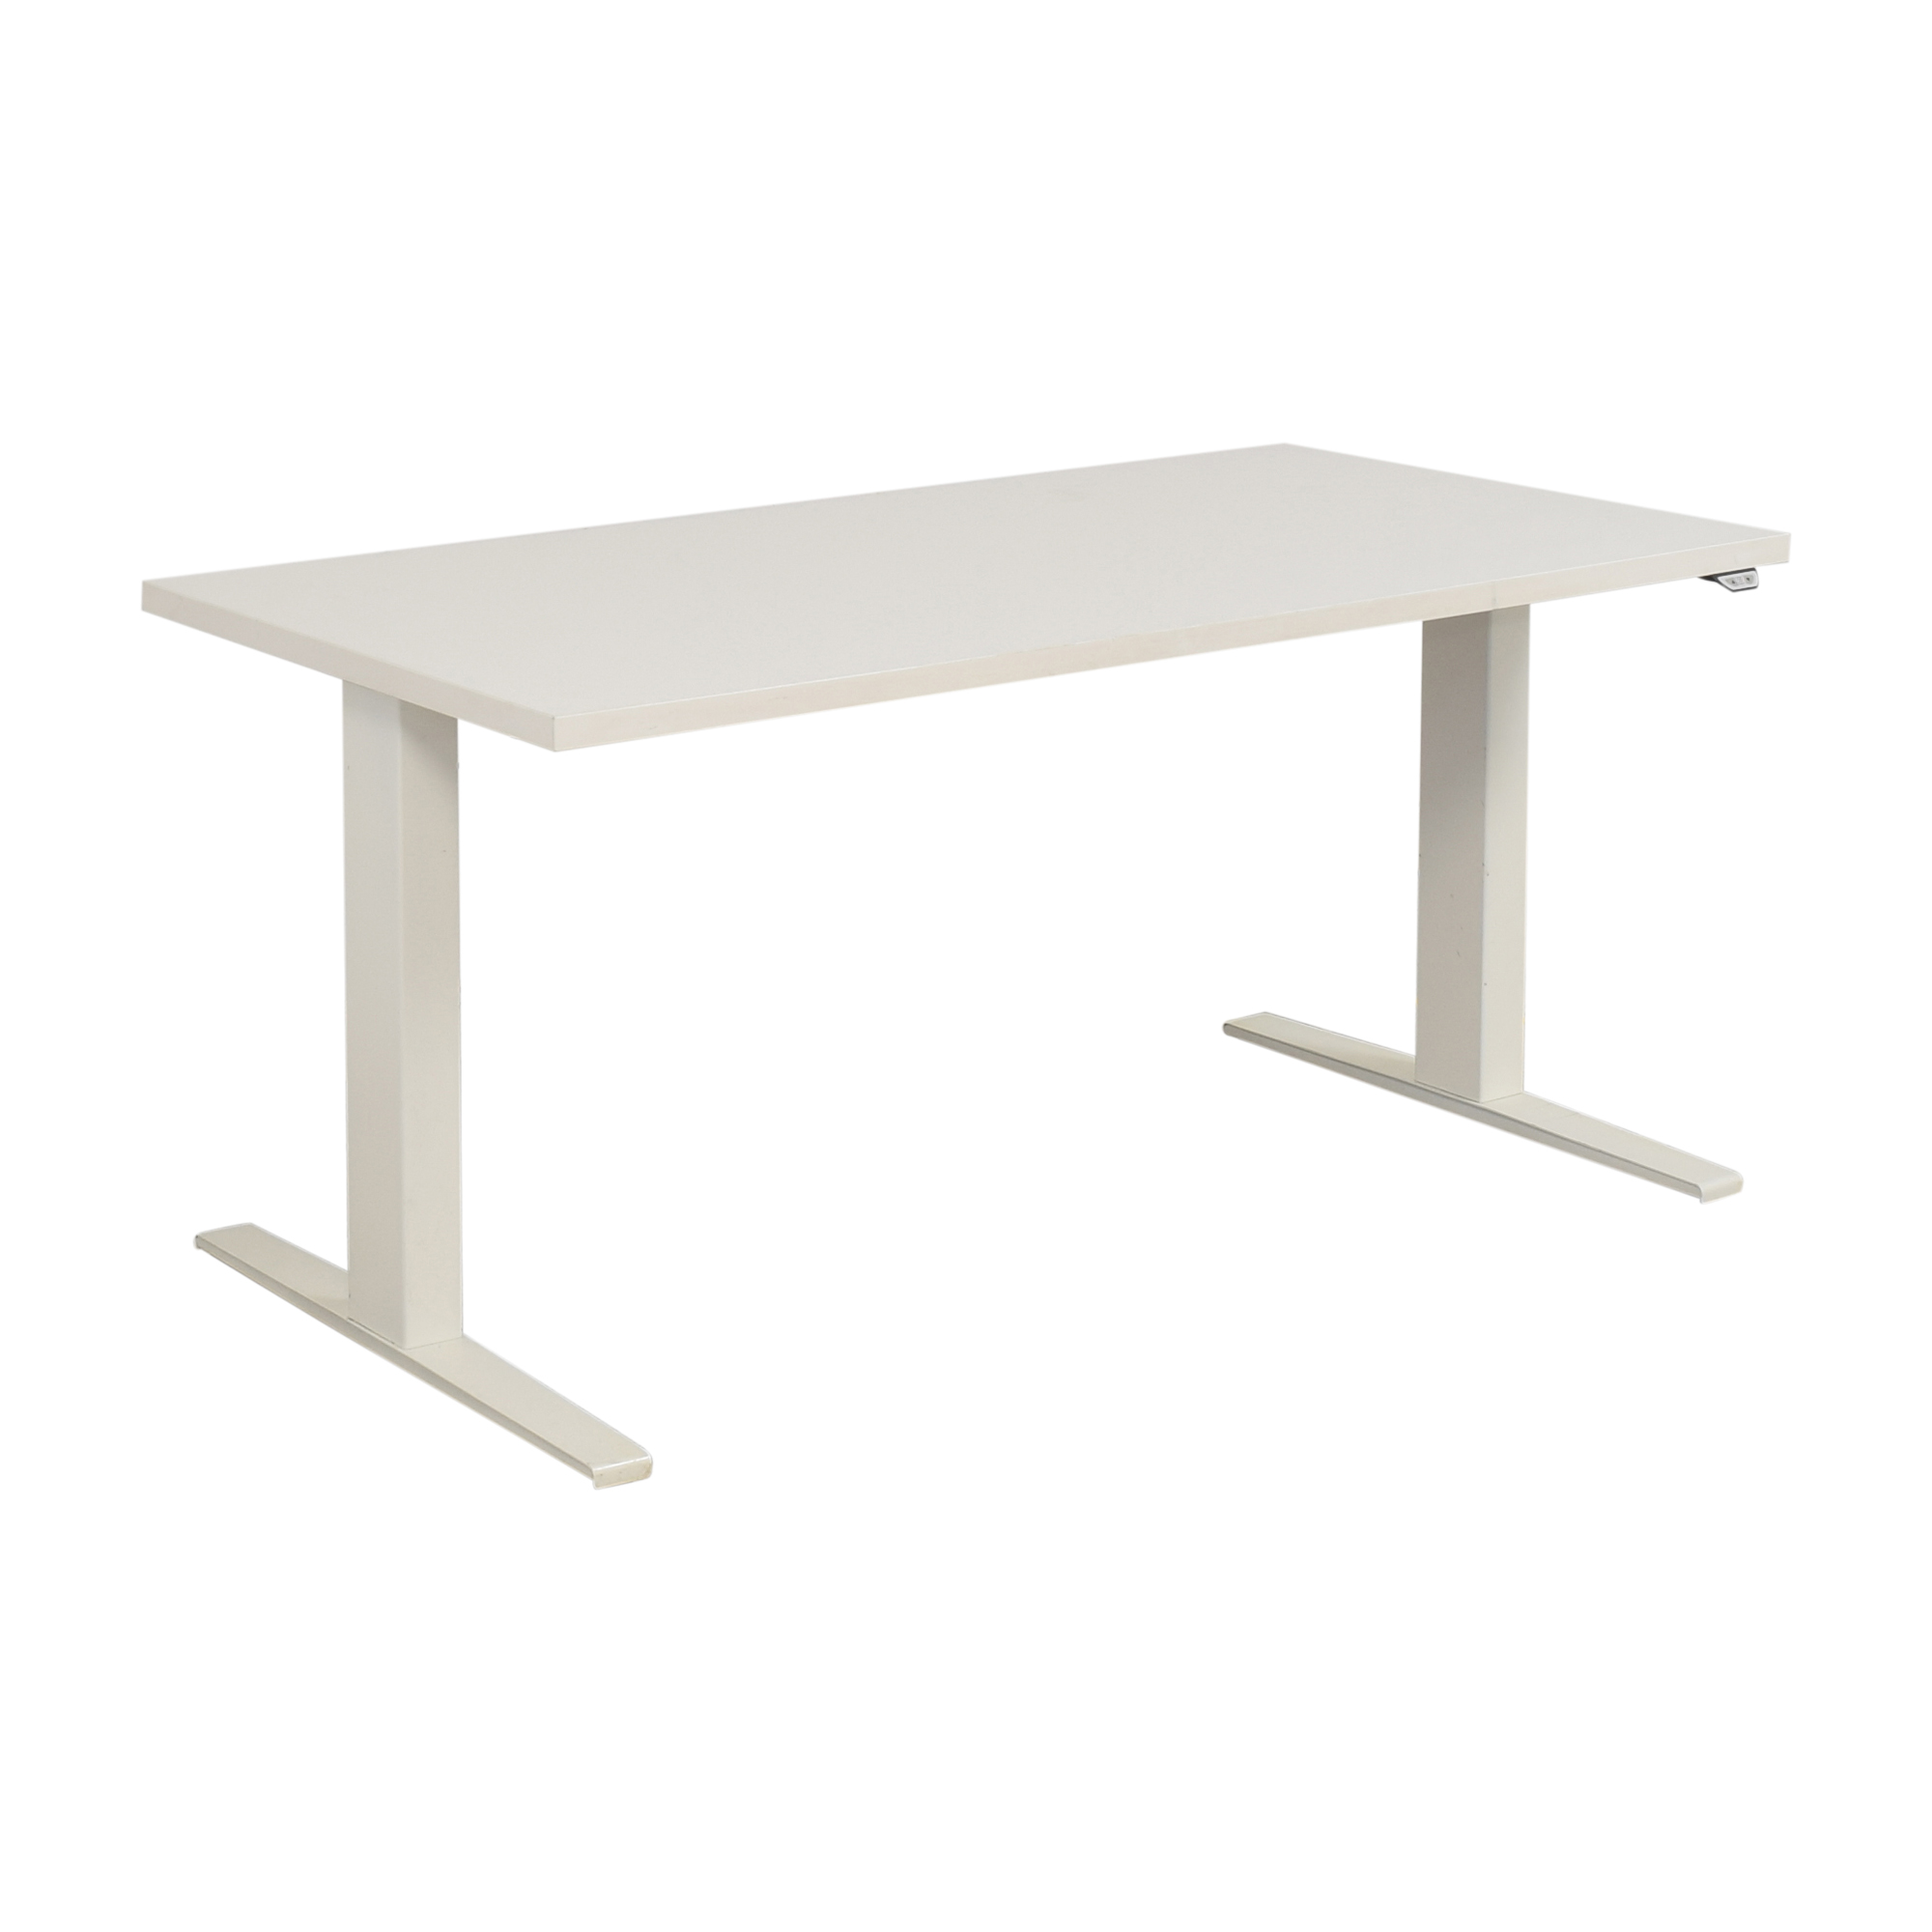 Herman Miller Herman Miller Motia Sit to Stand Desk white